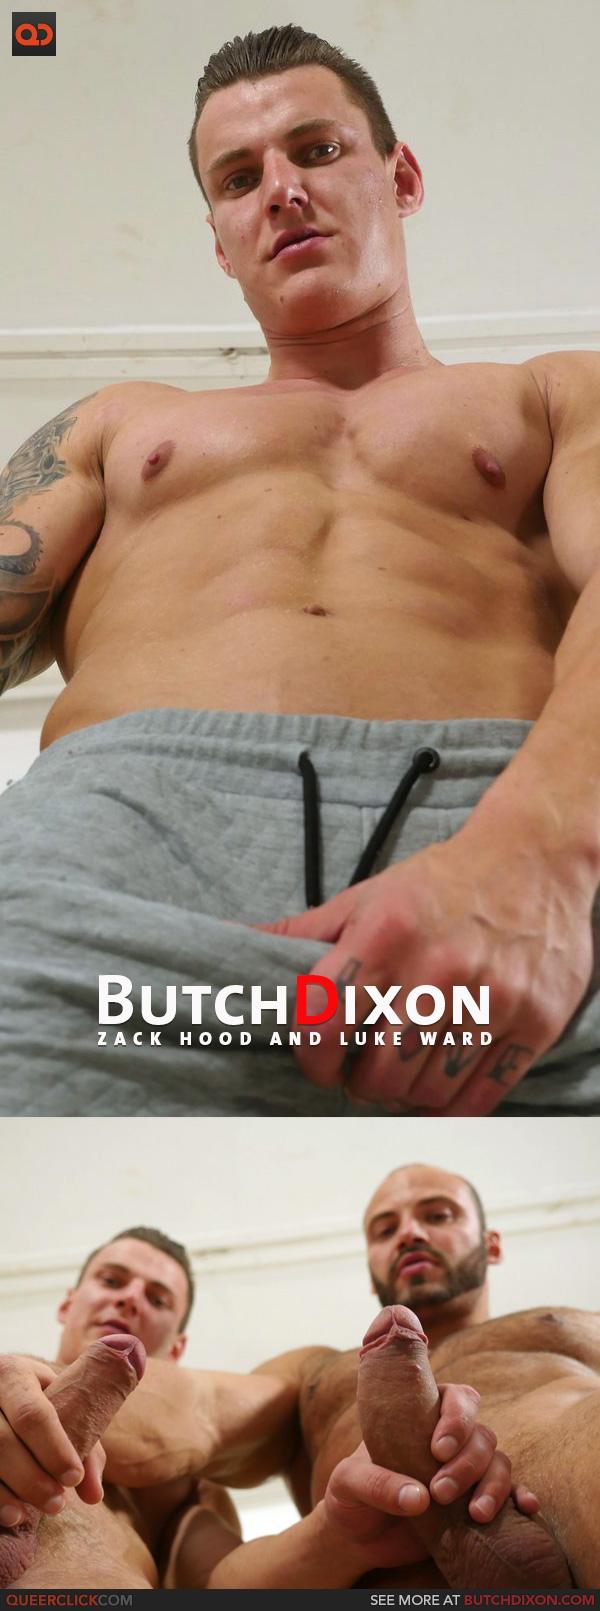 Butch Dixon: Zack Hood and Luke Ward